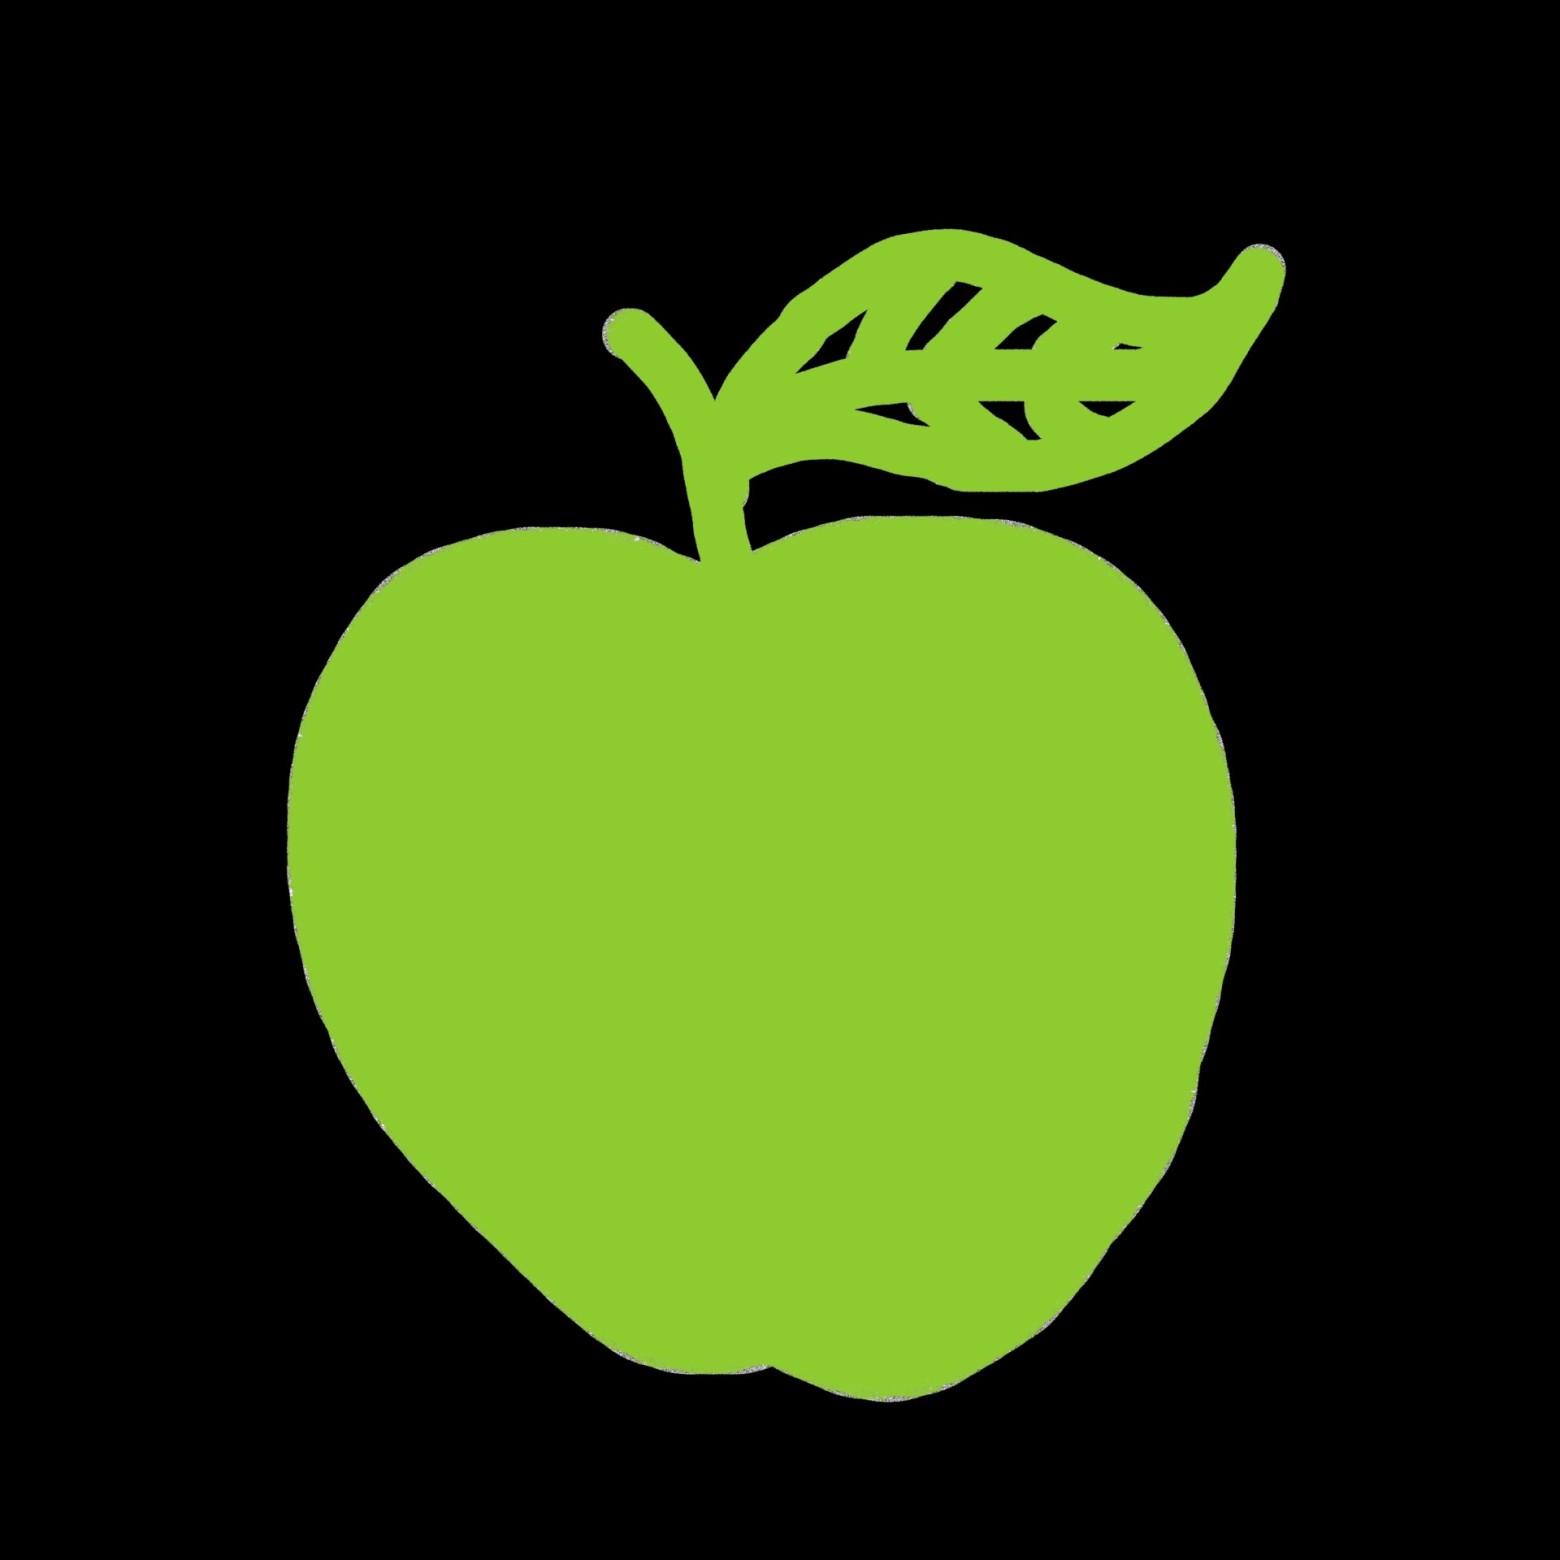 pomme verte sur fond noir  illustration